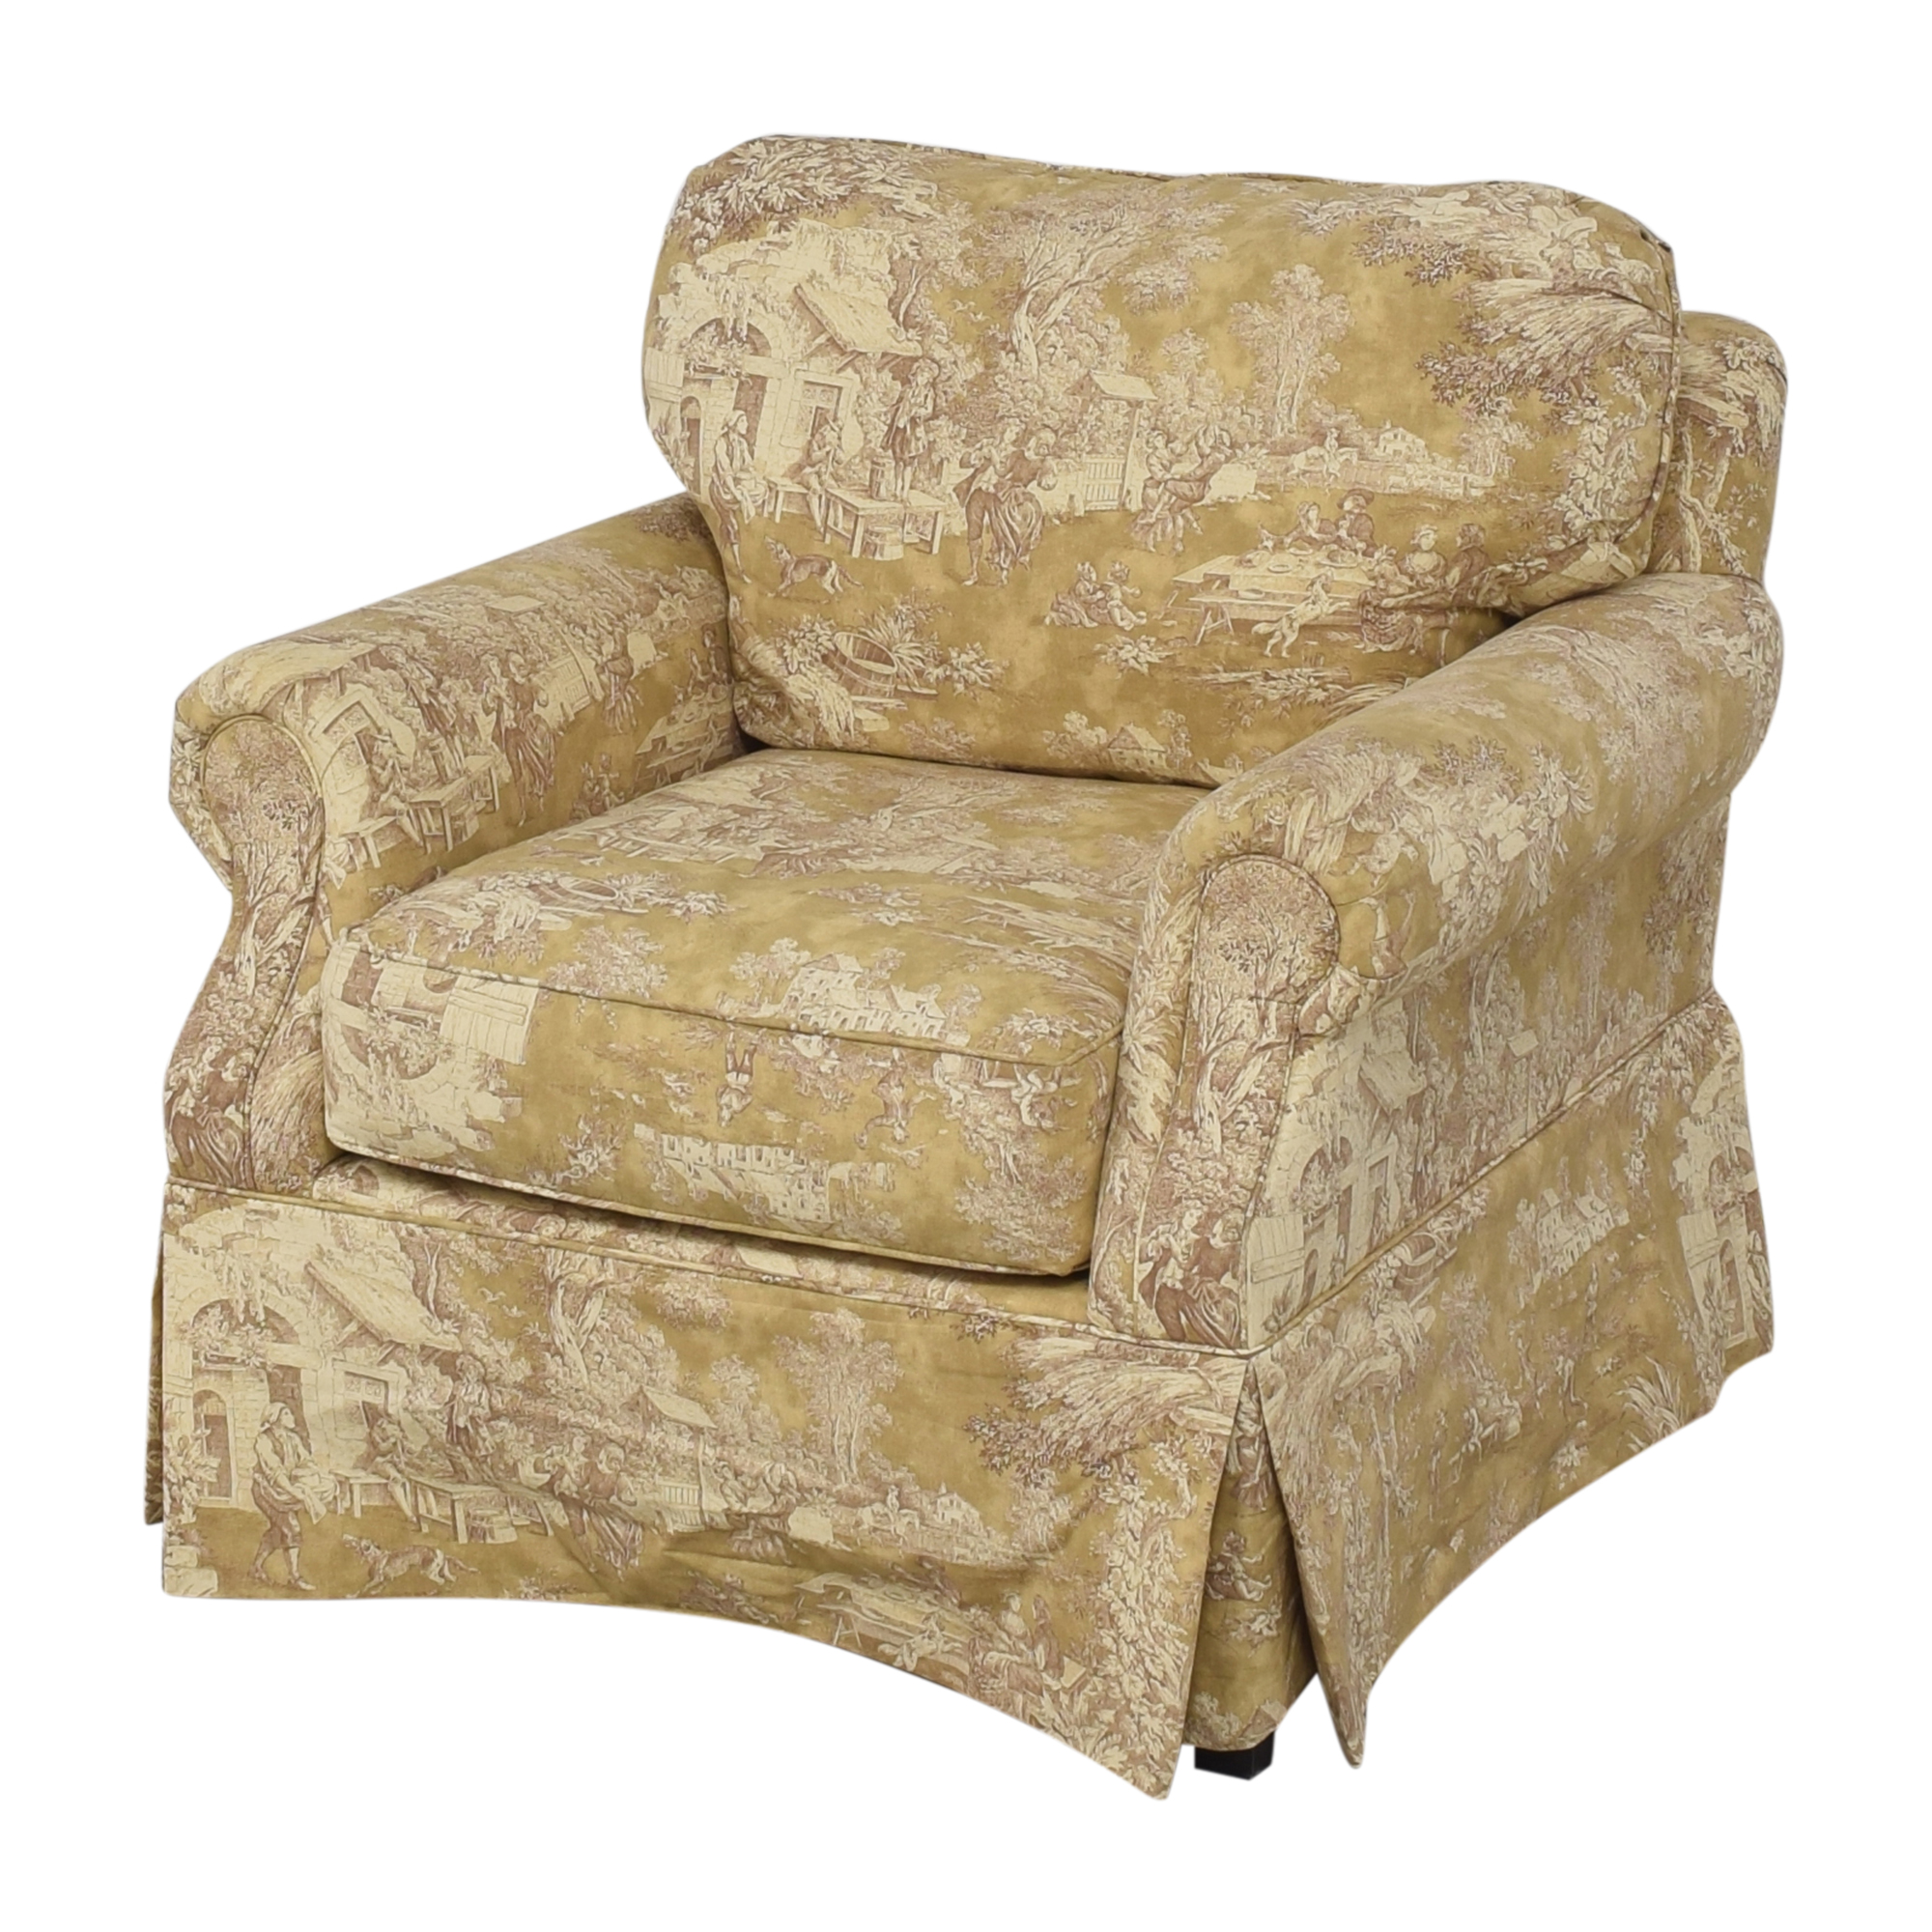 Domain Home Domain Home Toile Club Chair Accent Chairs